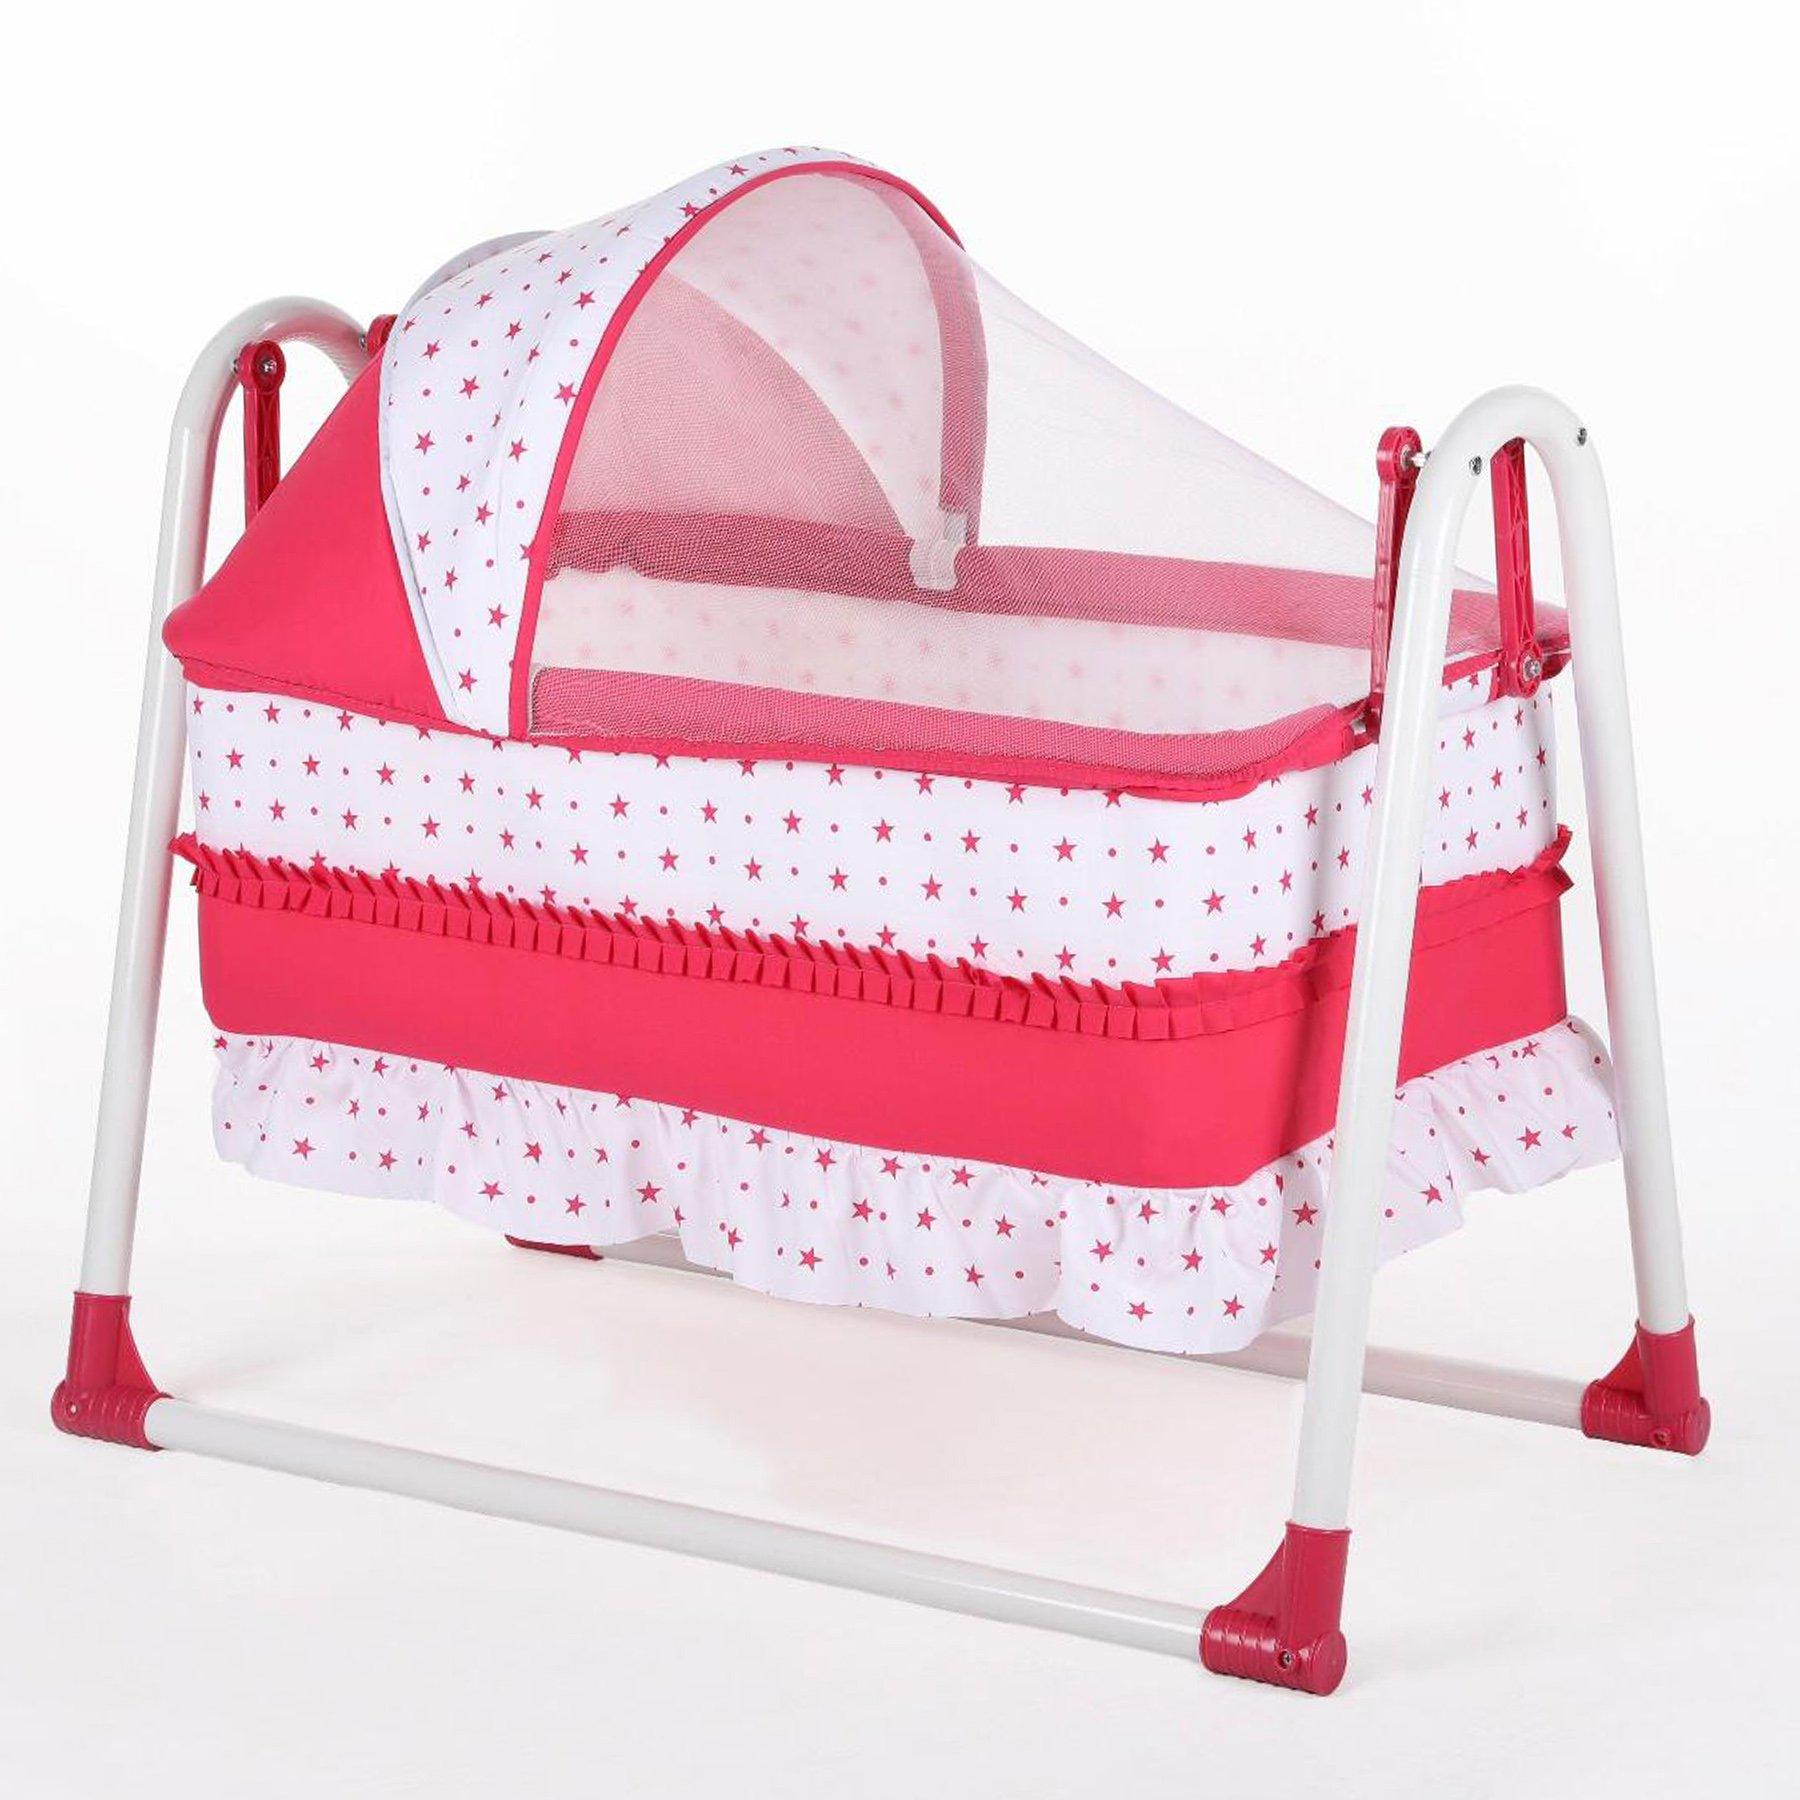 Bebegen Elite Portable Rocking Baby Crib Fuchsia